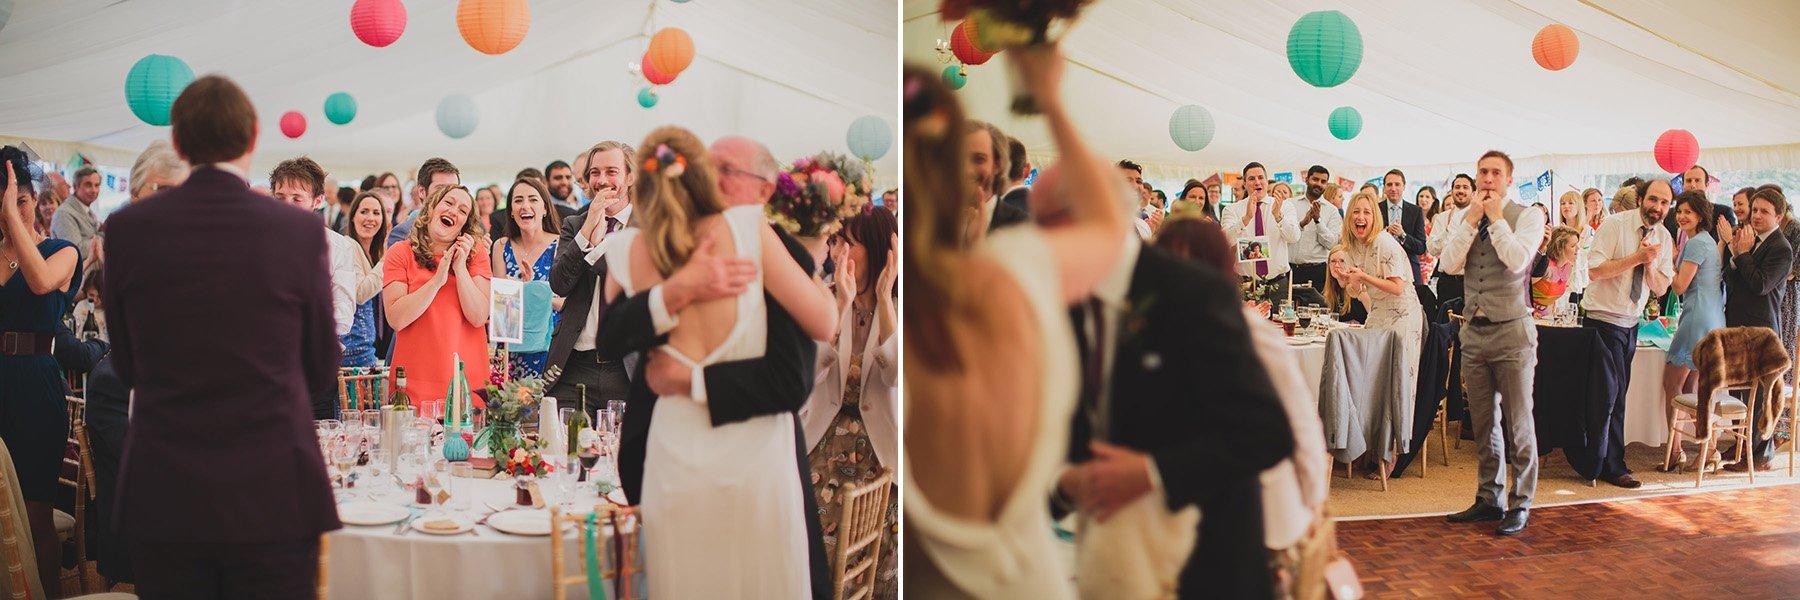 Buckinghamshire-Wedding-Lizzie-Duncan-119